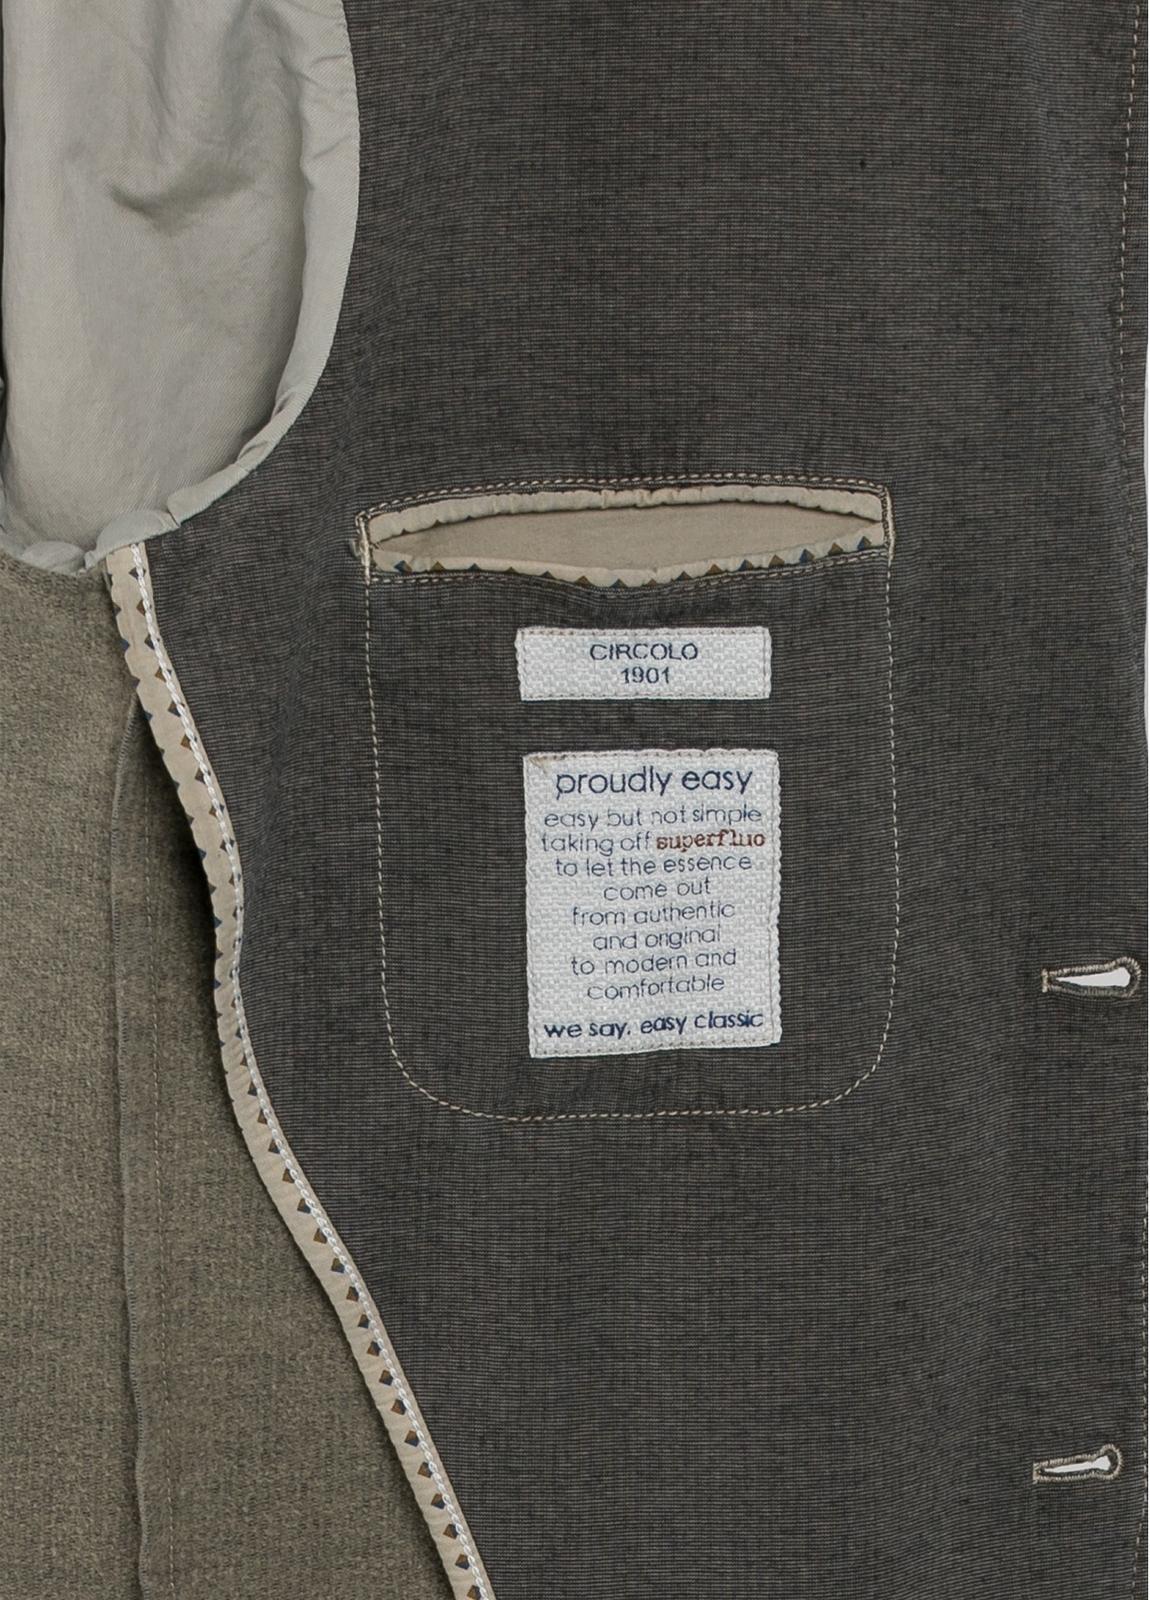 Americana soft 2 botones SLIM FIT color marrón. Doble felpa. - Ítem3